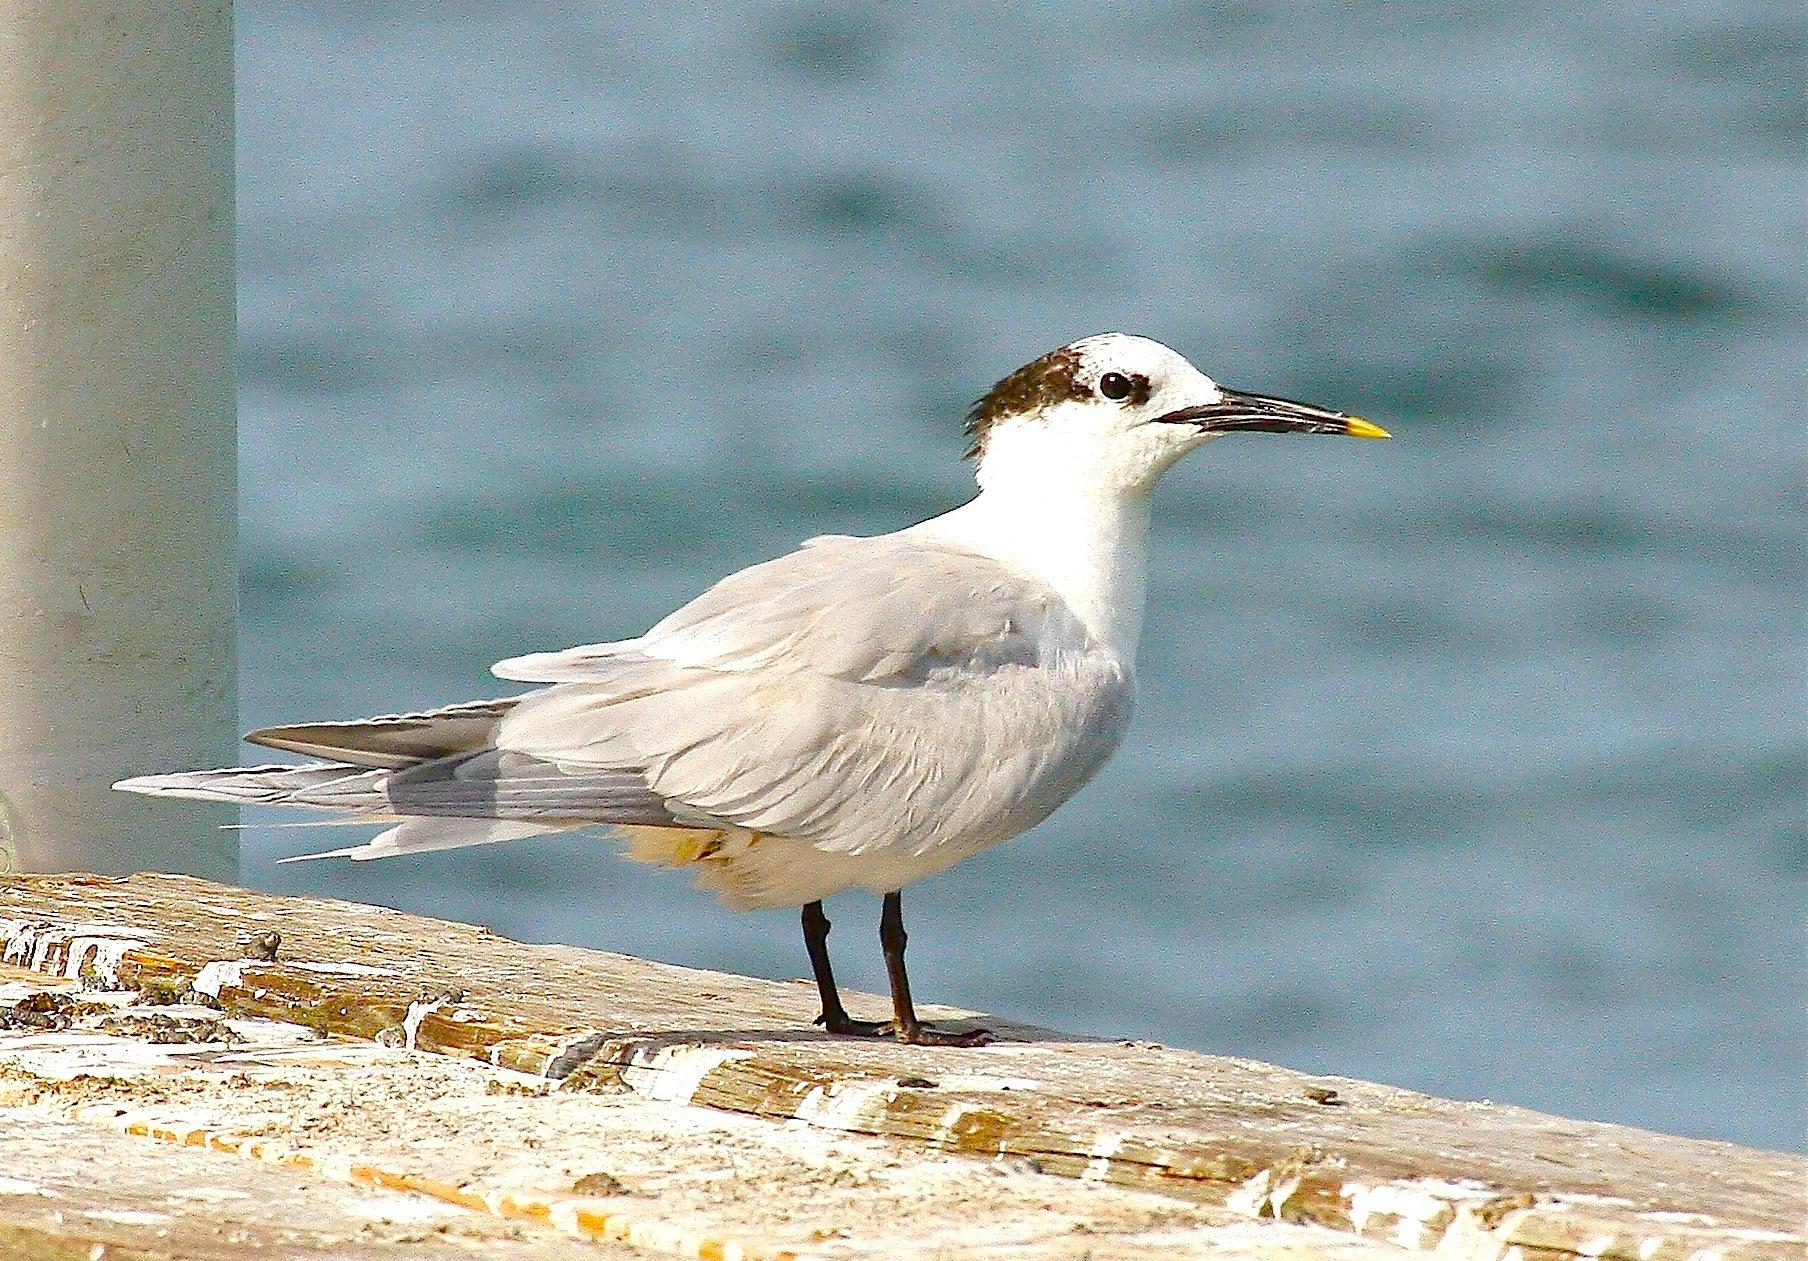 Sandwich Tern, Abaco Bahamas (Bruce Hallett)